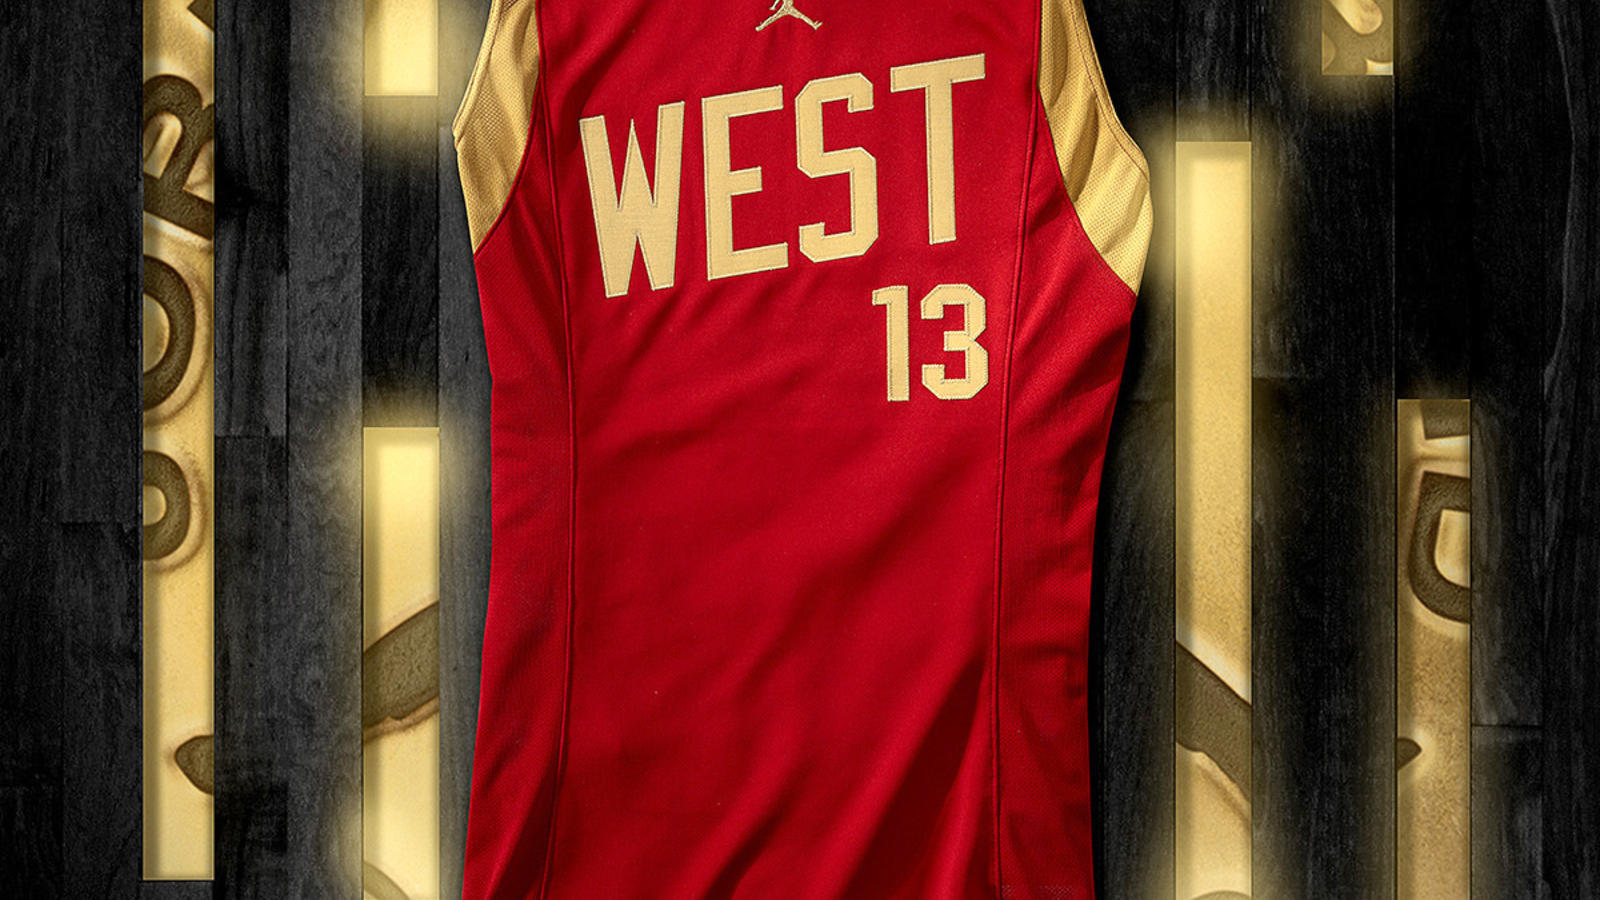 jordan_brand_classic_west_jersey